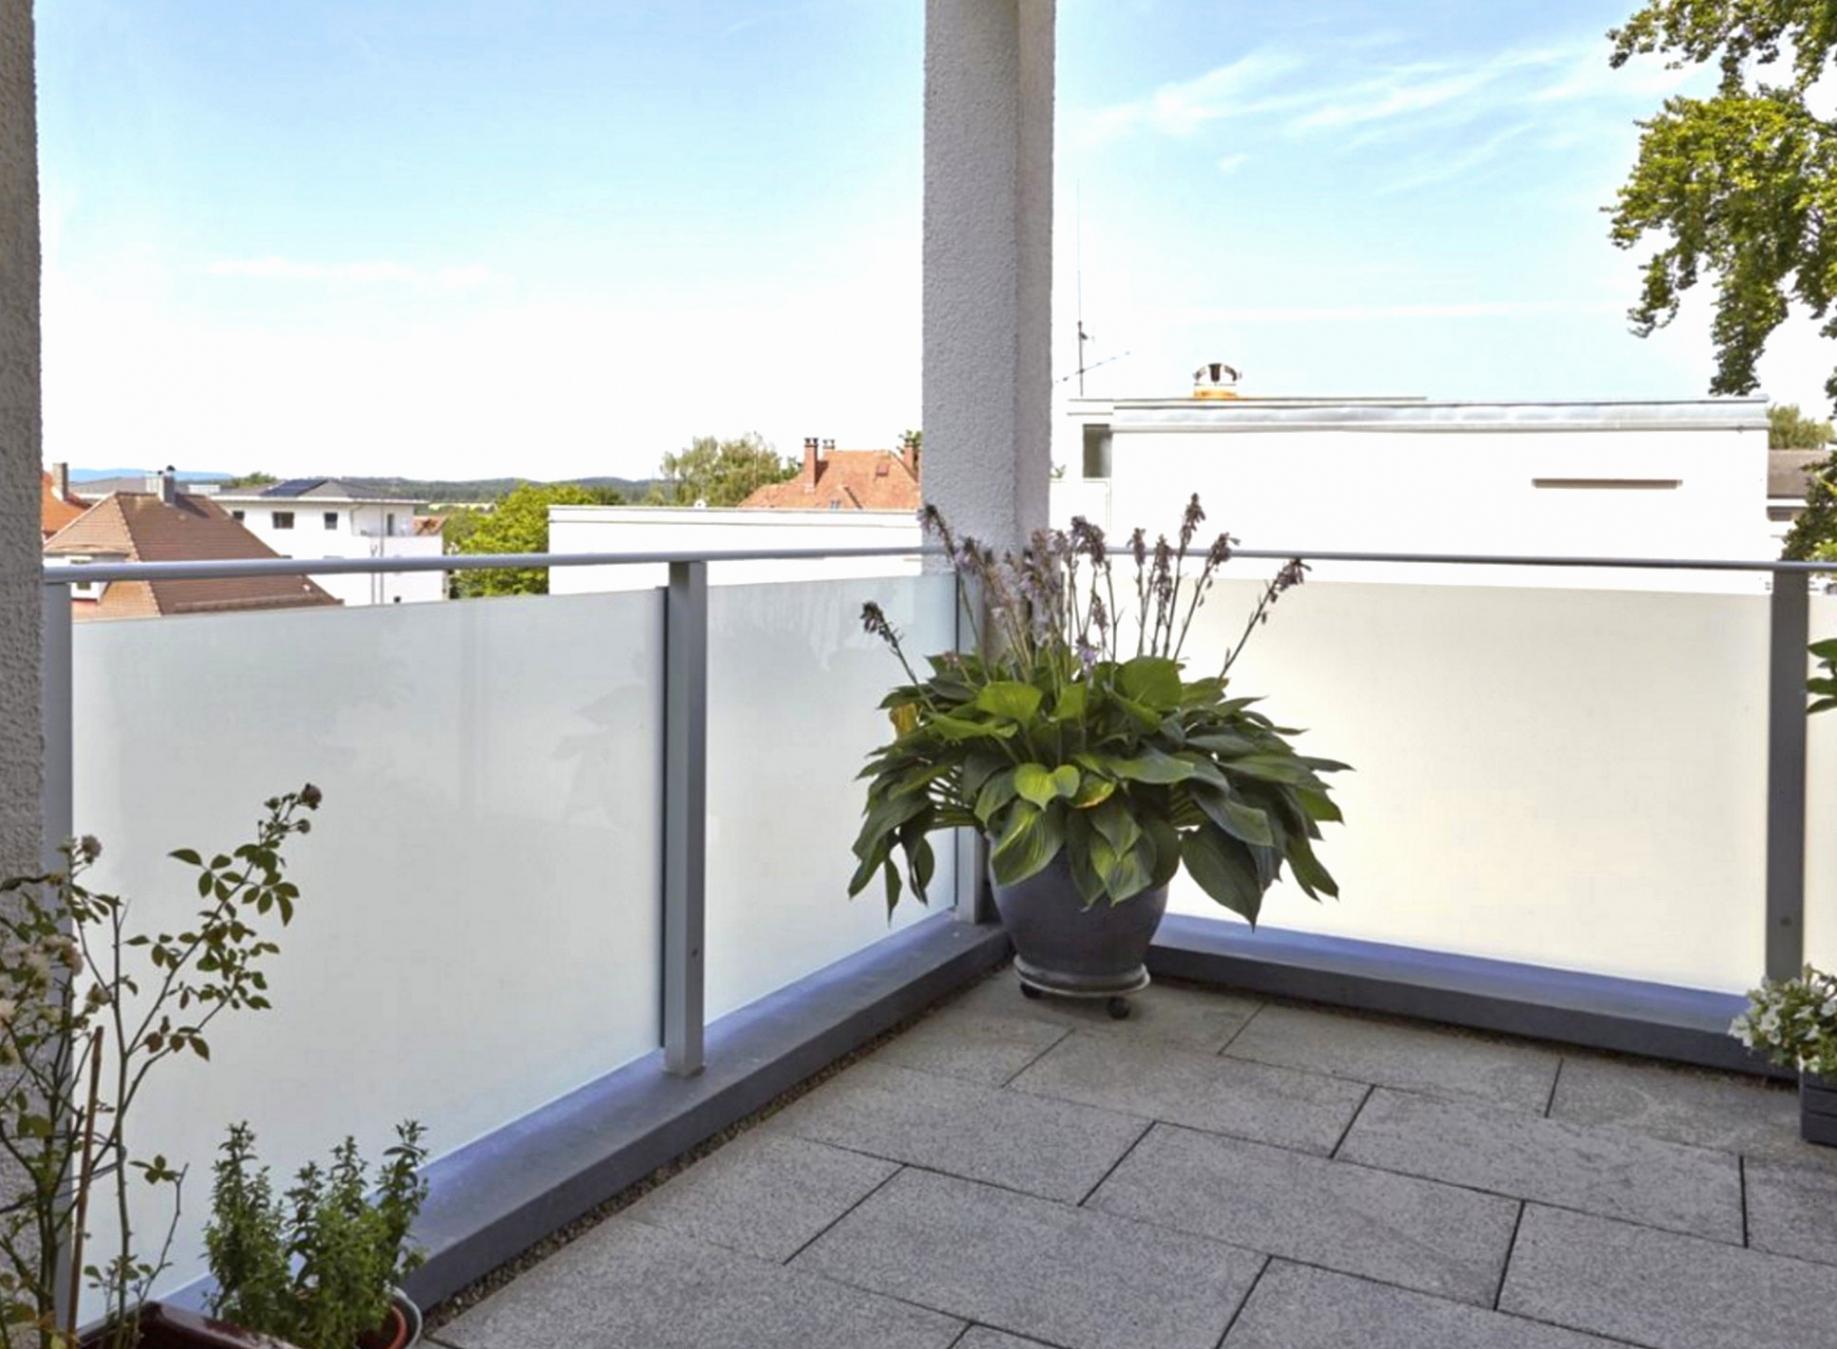 Garten Deko Rost Luxus Gartendeko Selber Machen — Temobardz Home Blog